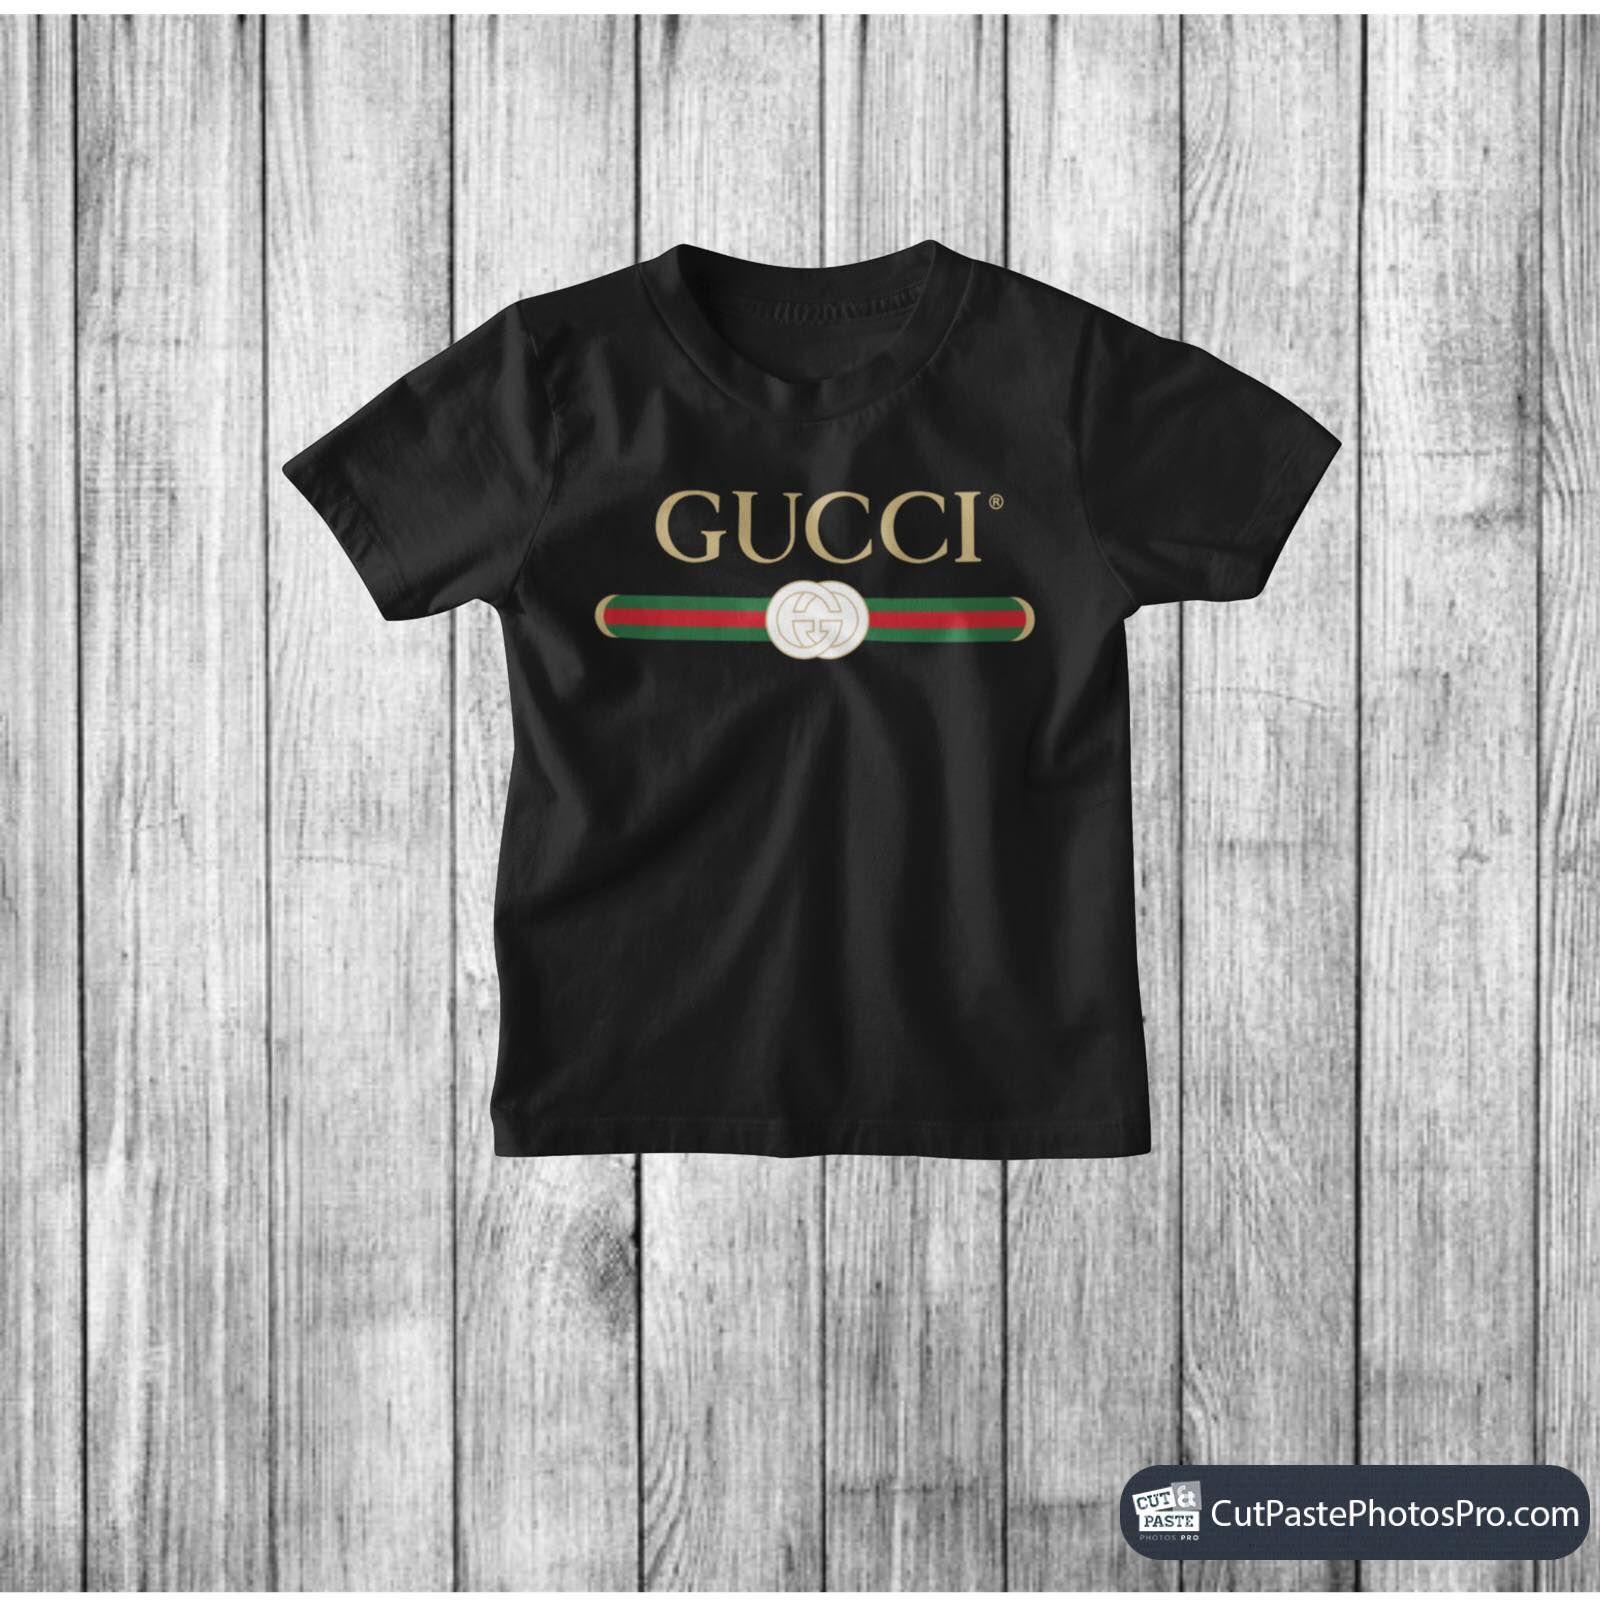 3470219ae168e 😍I LOVE THIS!!😍 Toddler Gucci Shirt - Gucci shirt - Baby Gucci ...